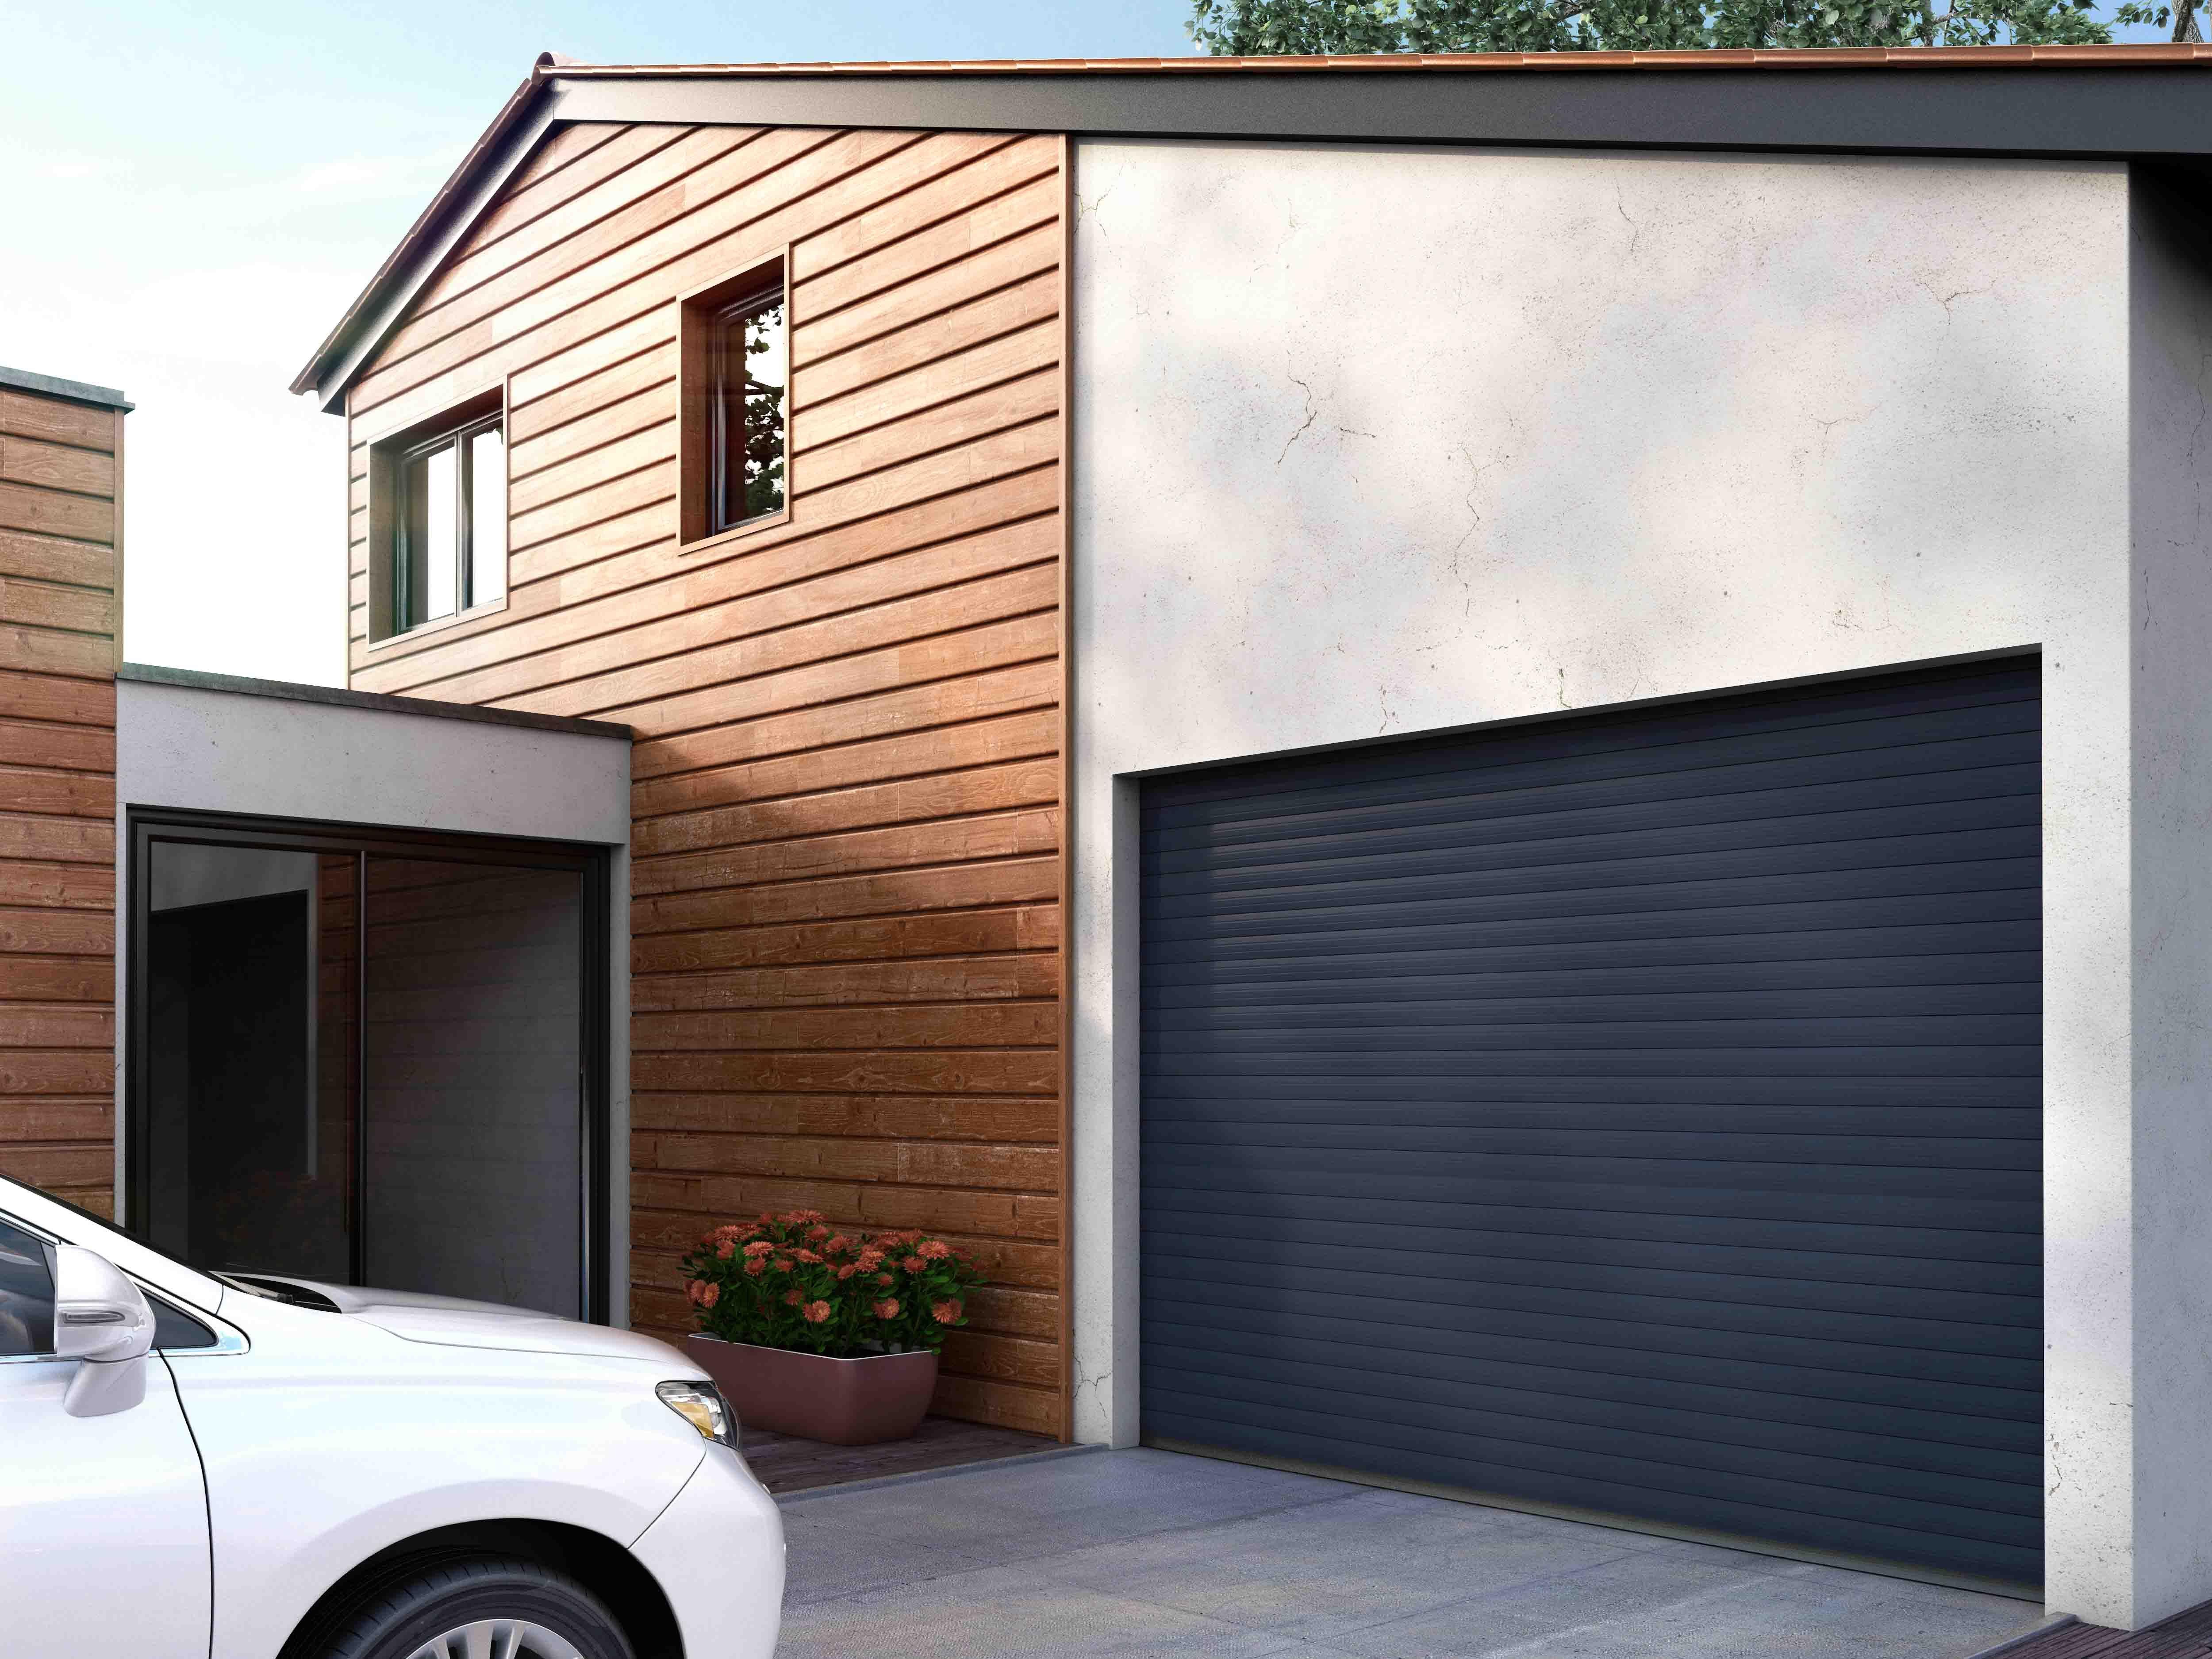 Porte De Garage Enroulable Easydoor C Franciaflex Porte Garage Maison Garage